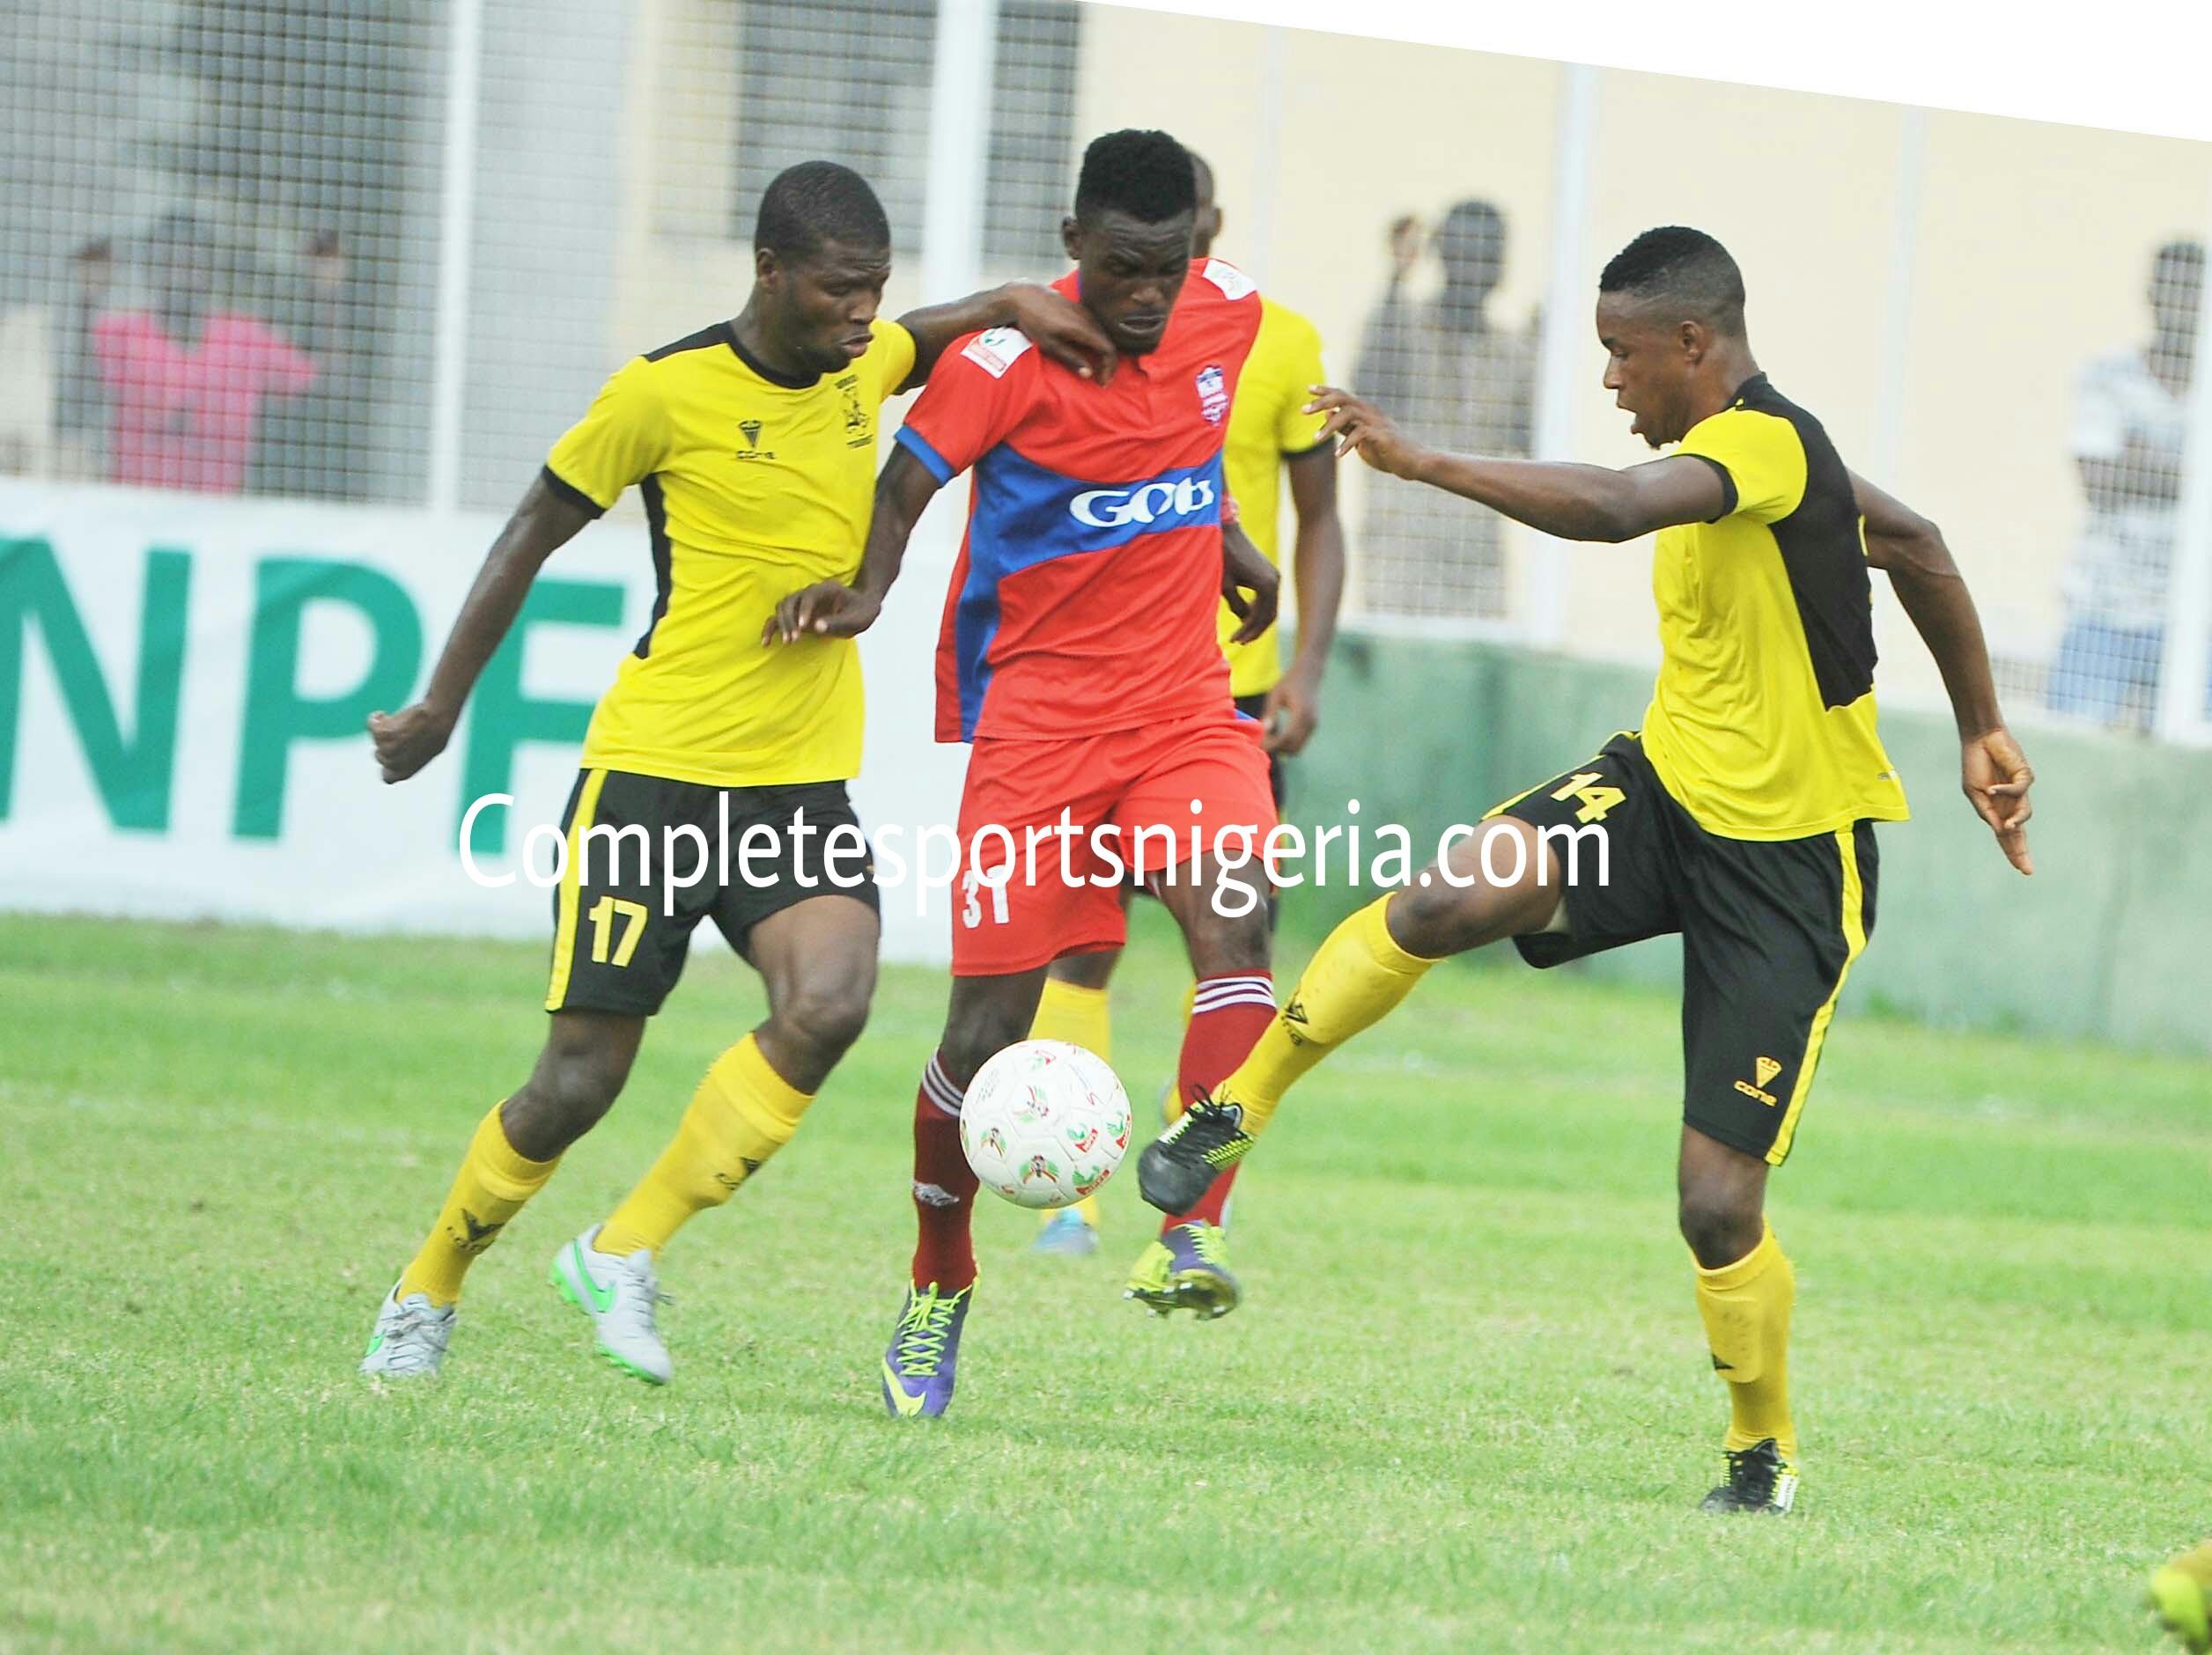 NPFL: Wikki Stay Top, Rangers Shock Heartland, Enyimba Lose Again